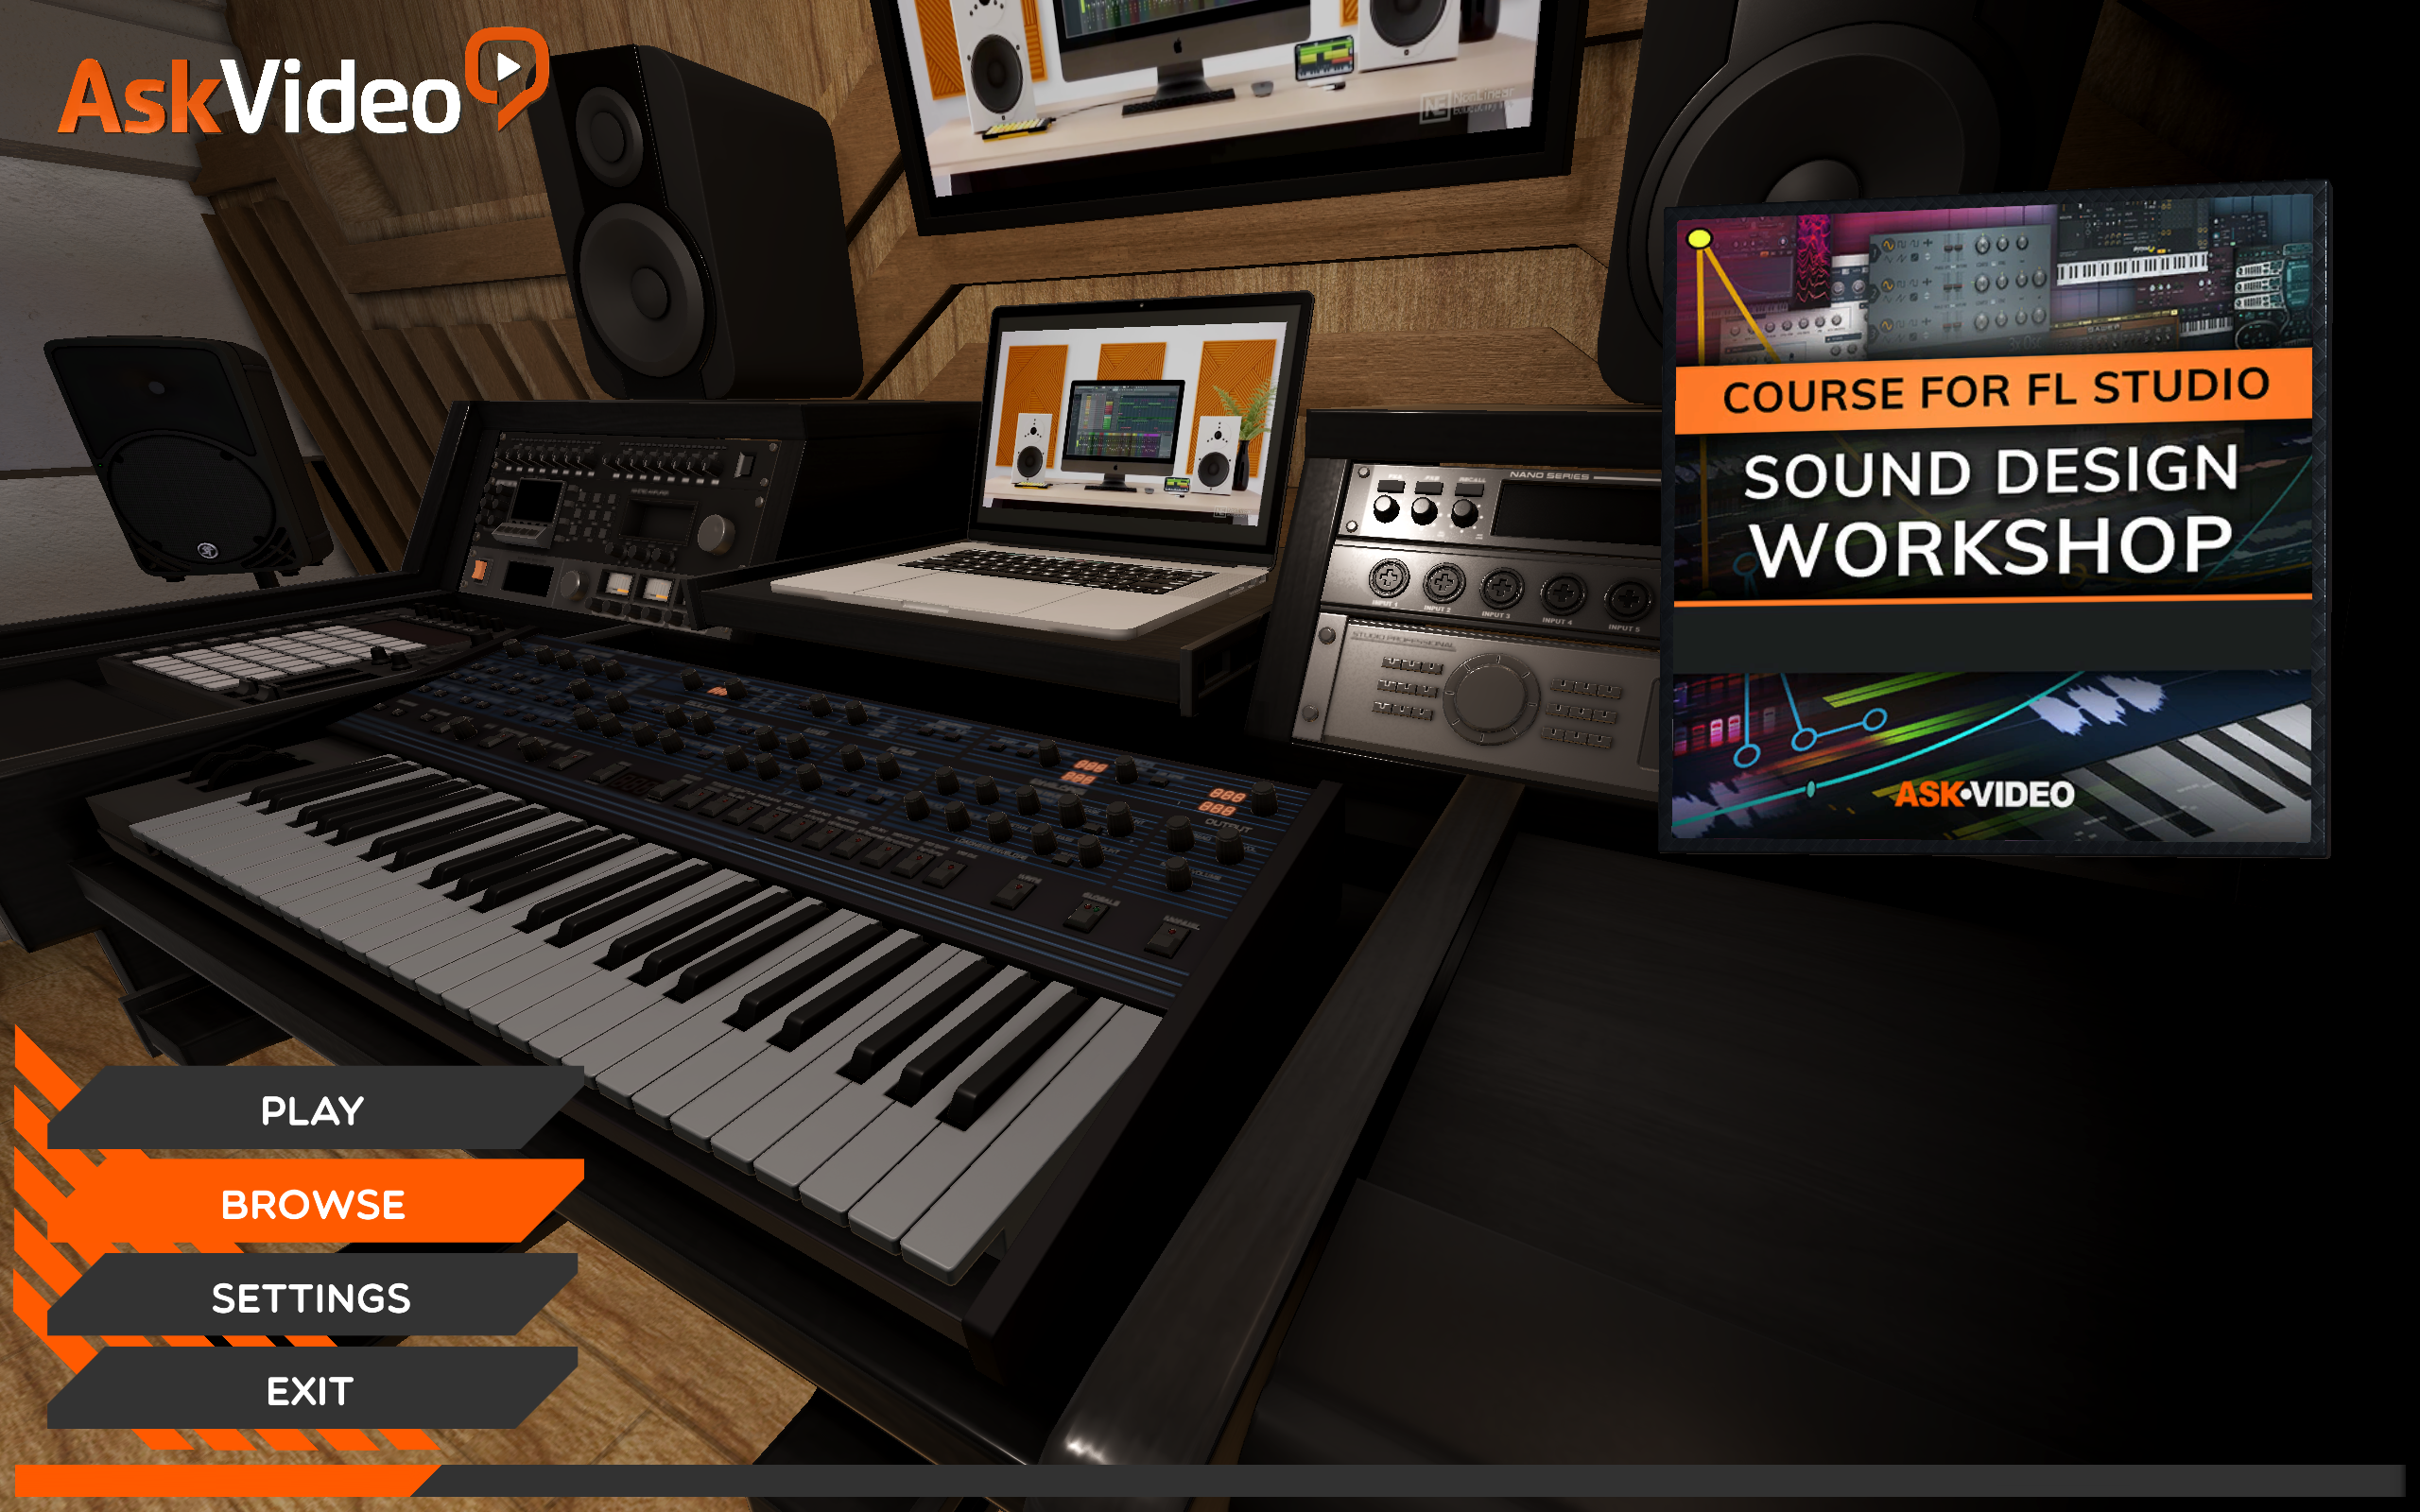 Sound Design Workshop For FL Studio By Ask.Video: Amazon.es ...